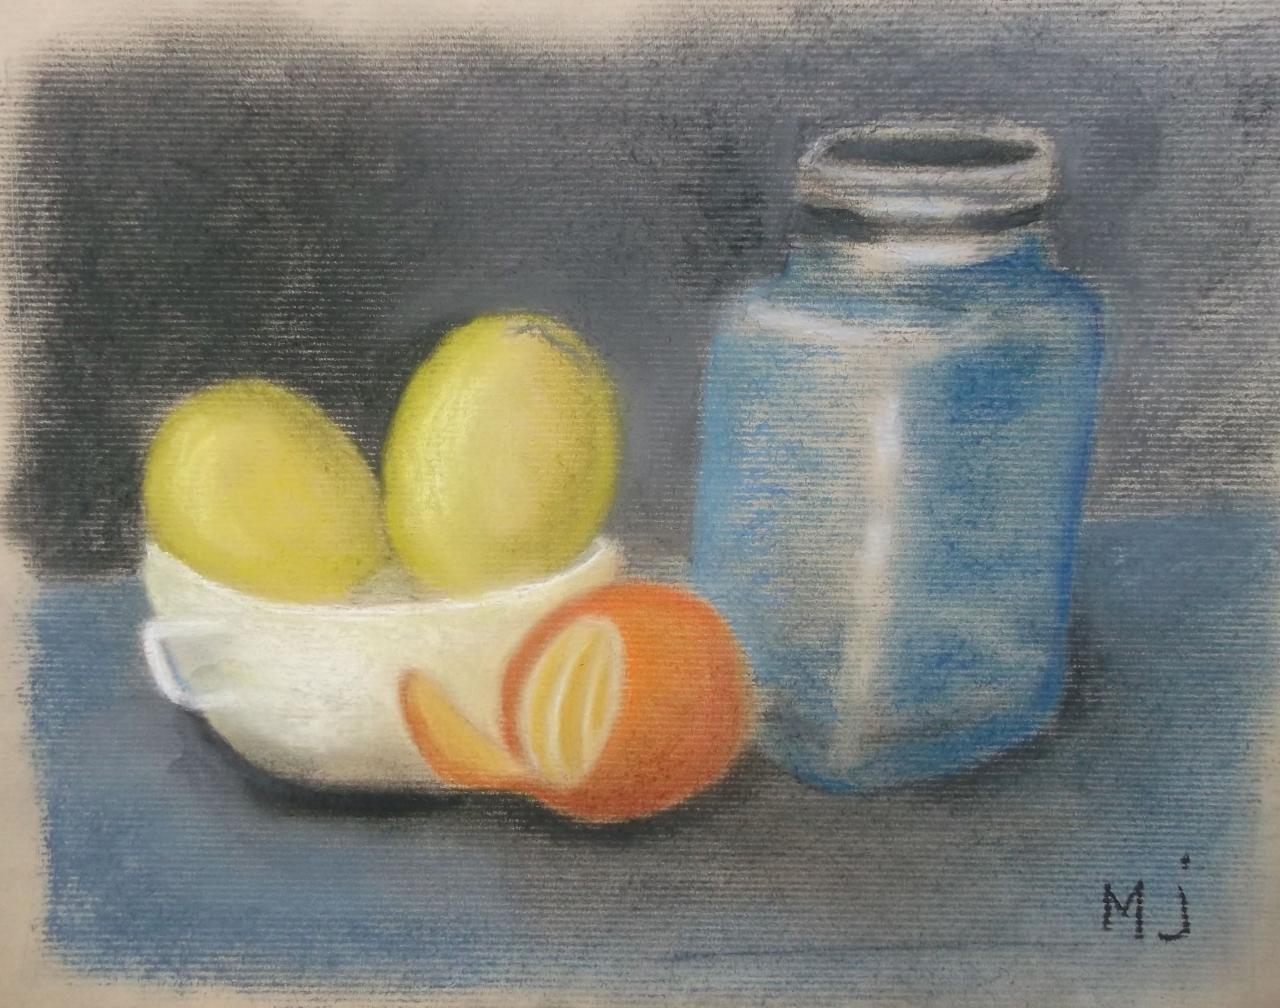 Marie-J0 citrons mandarine et bocal Pastel sec octobre 2017 (1)